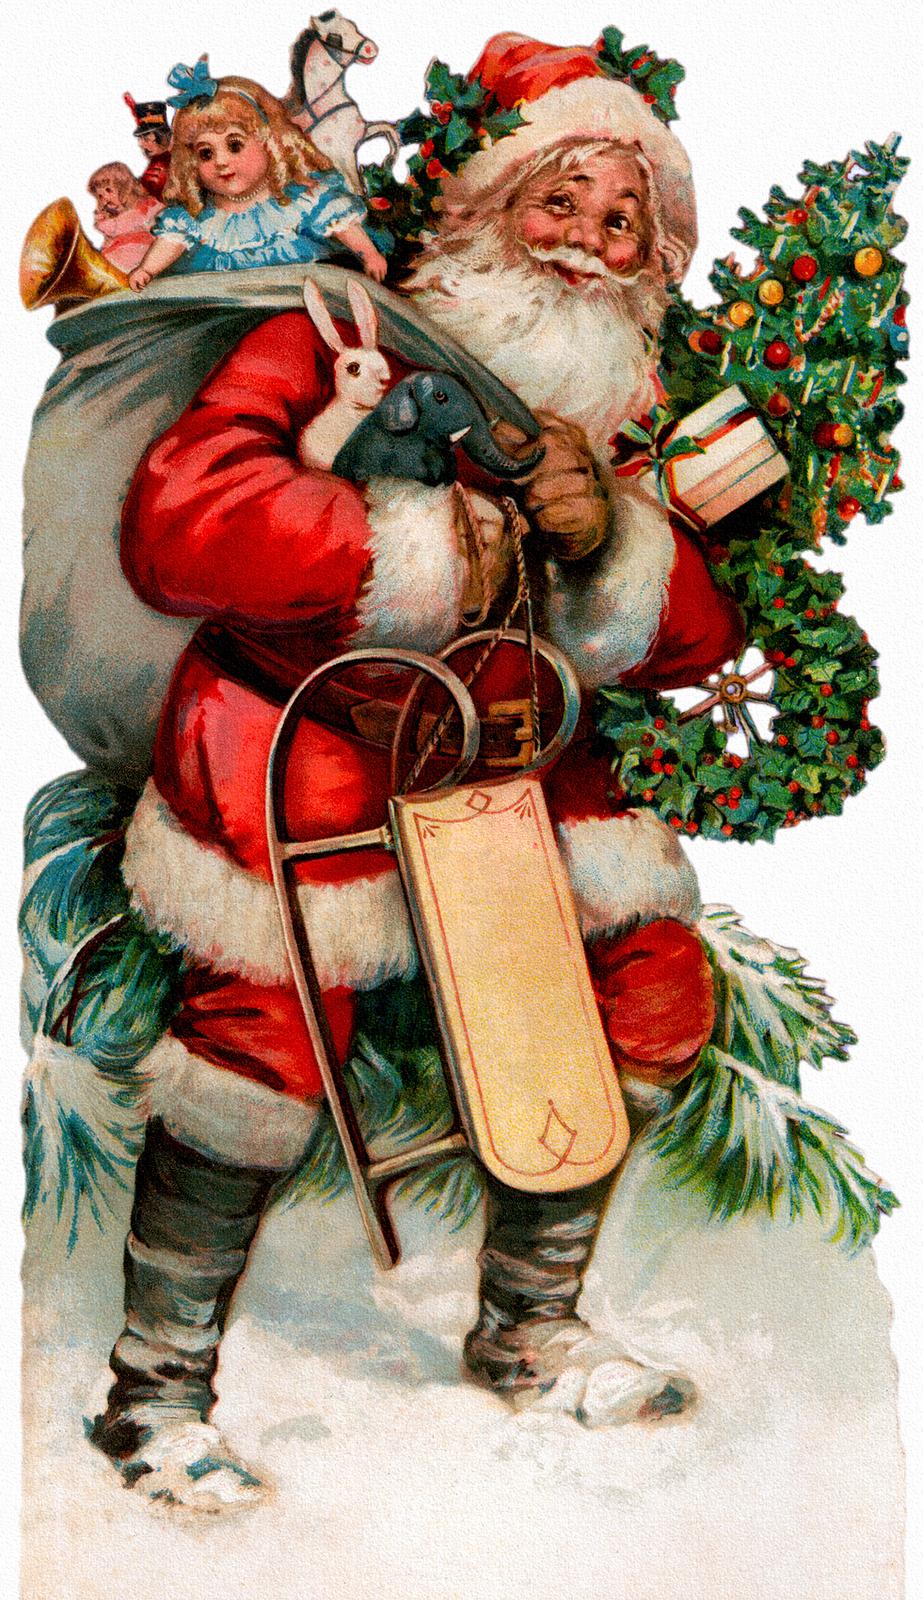 Vintage Santa Images 104